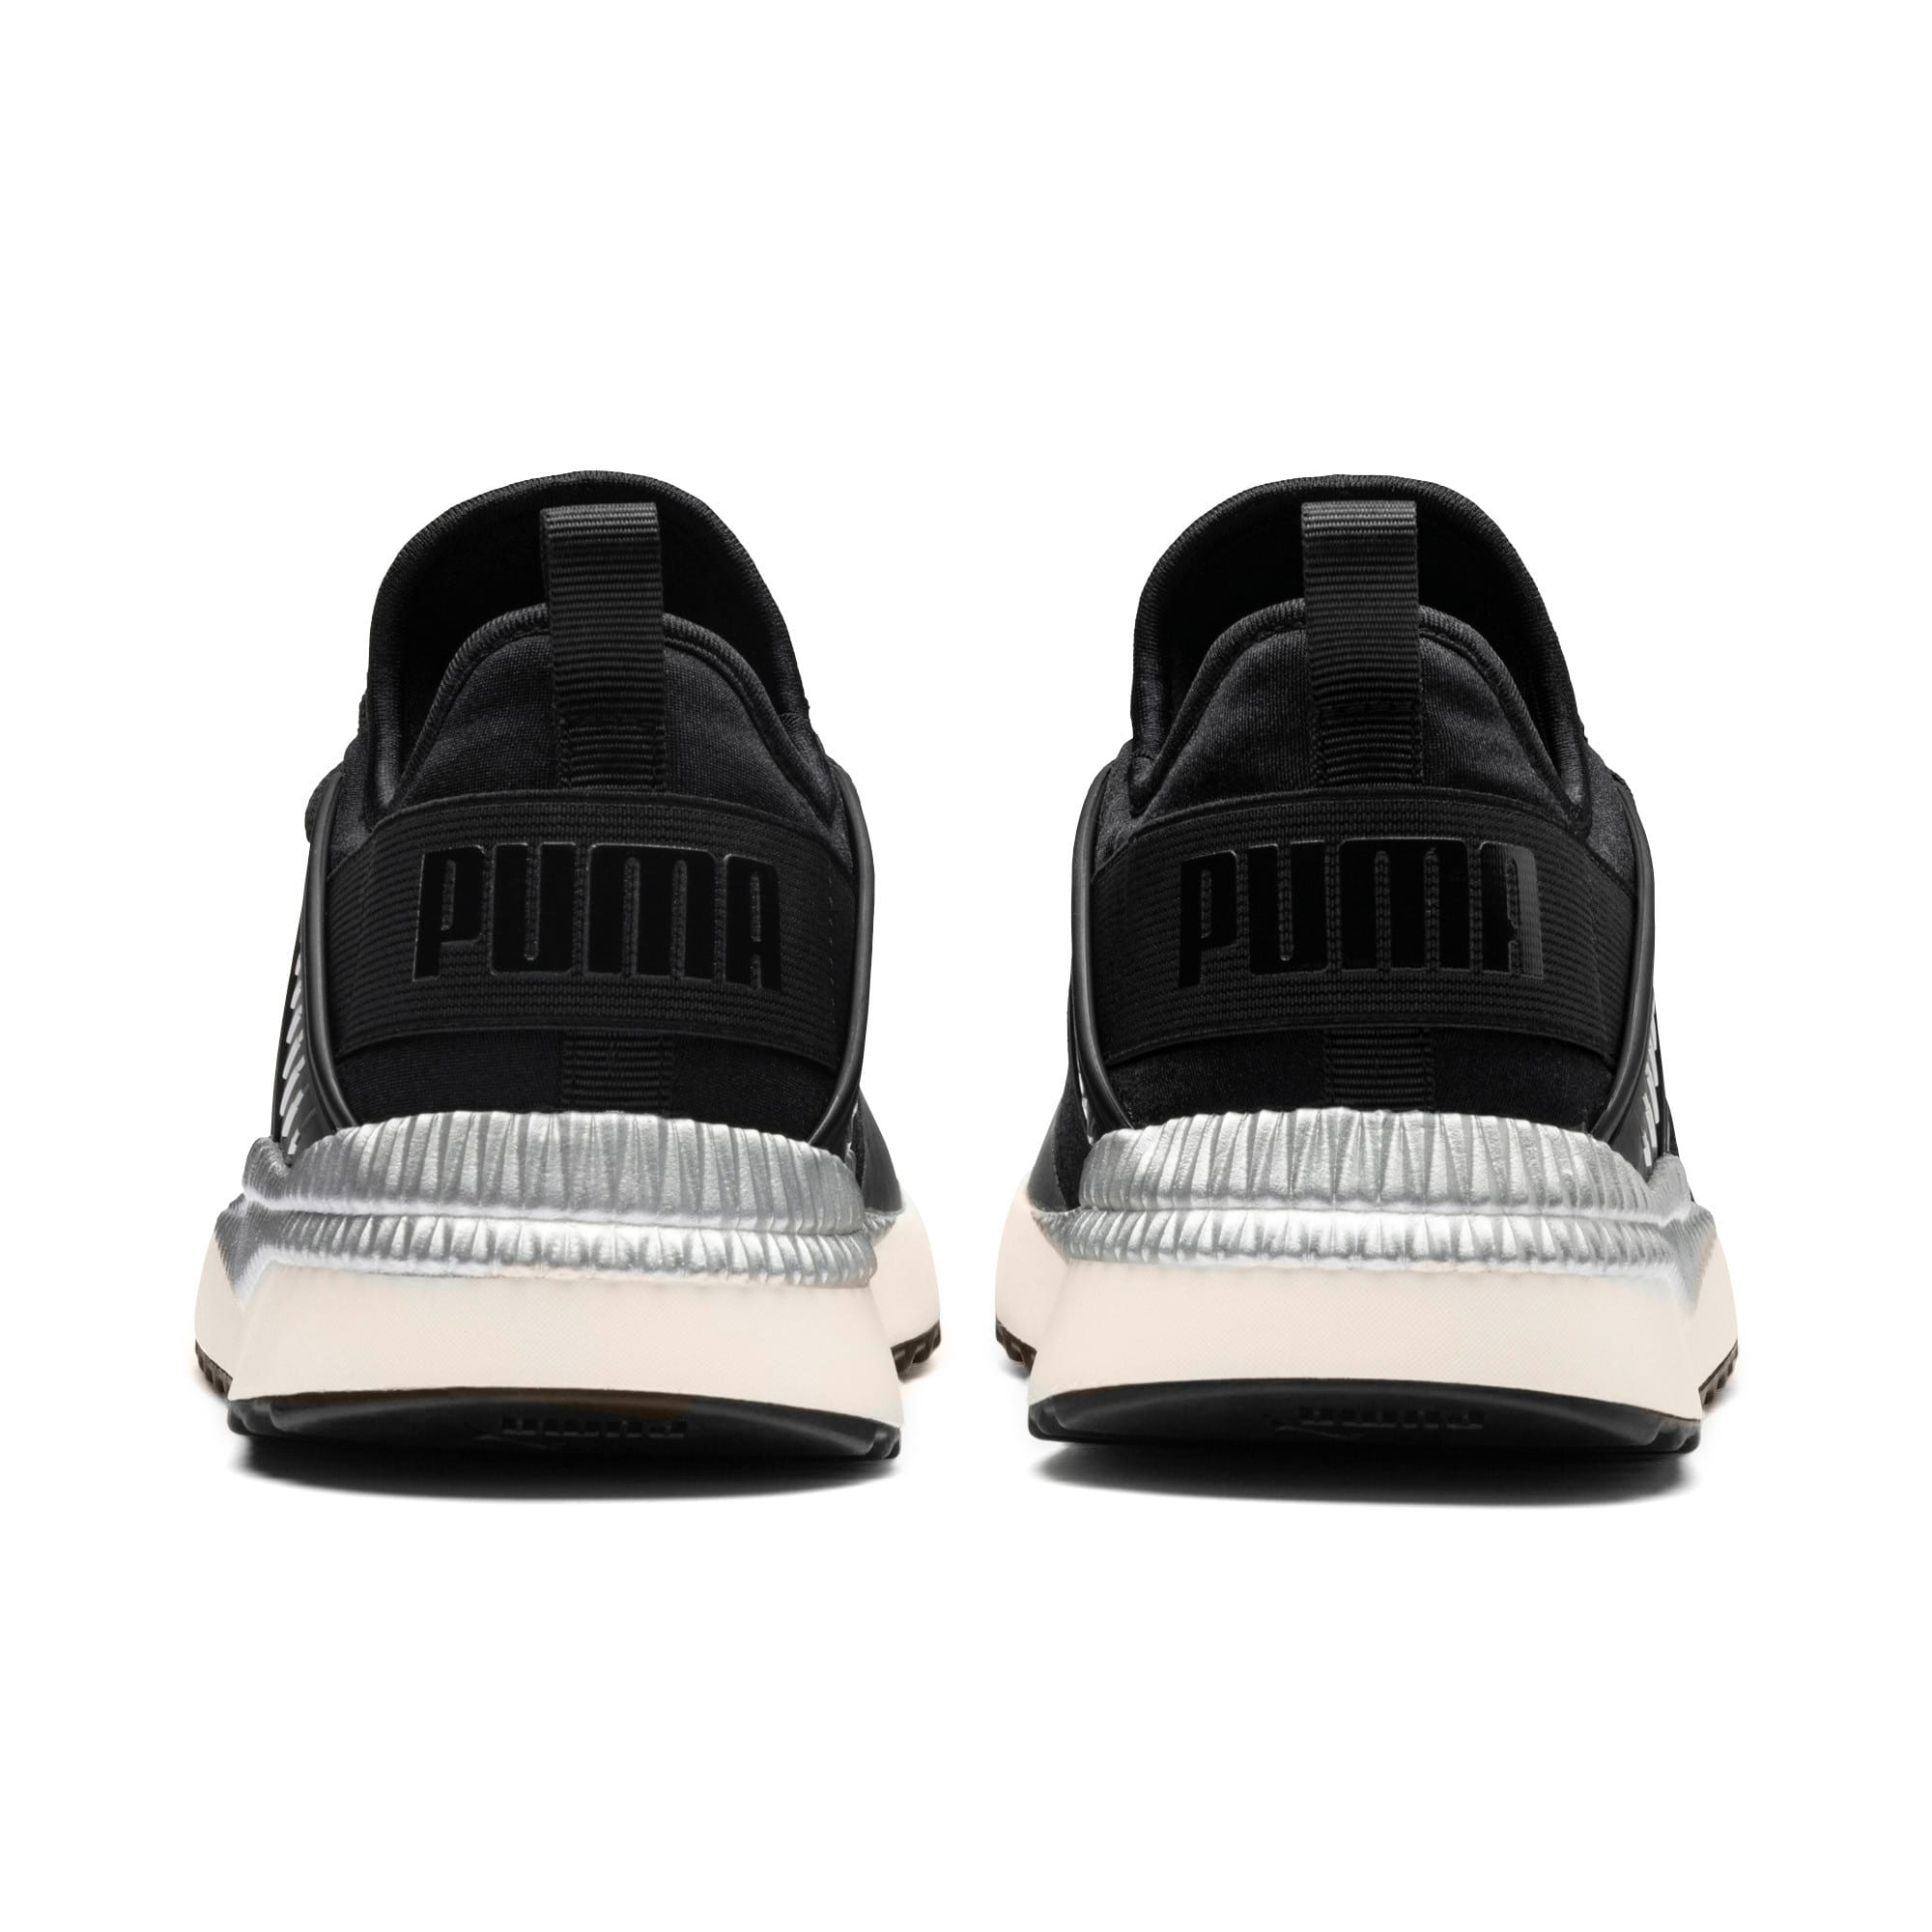 Thumbnail 4 of Pacer Next Cage ST2 Women's Sneakers, P Black-Black-Whisper White, medium